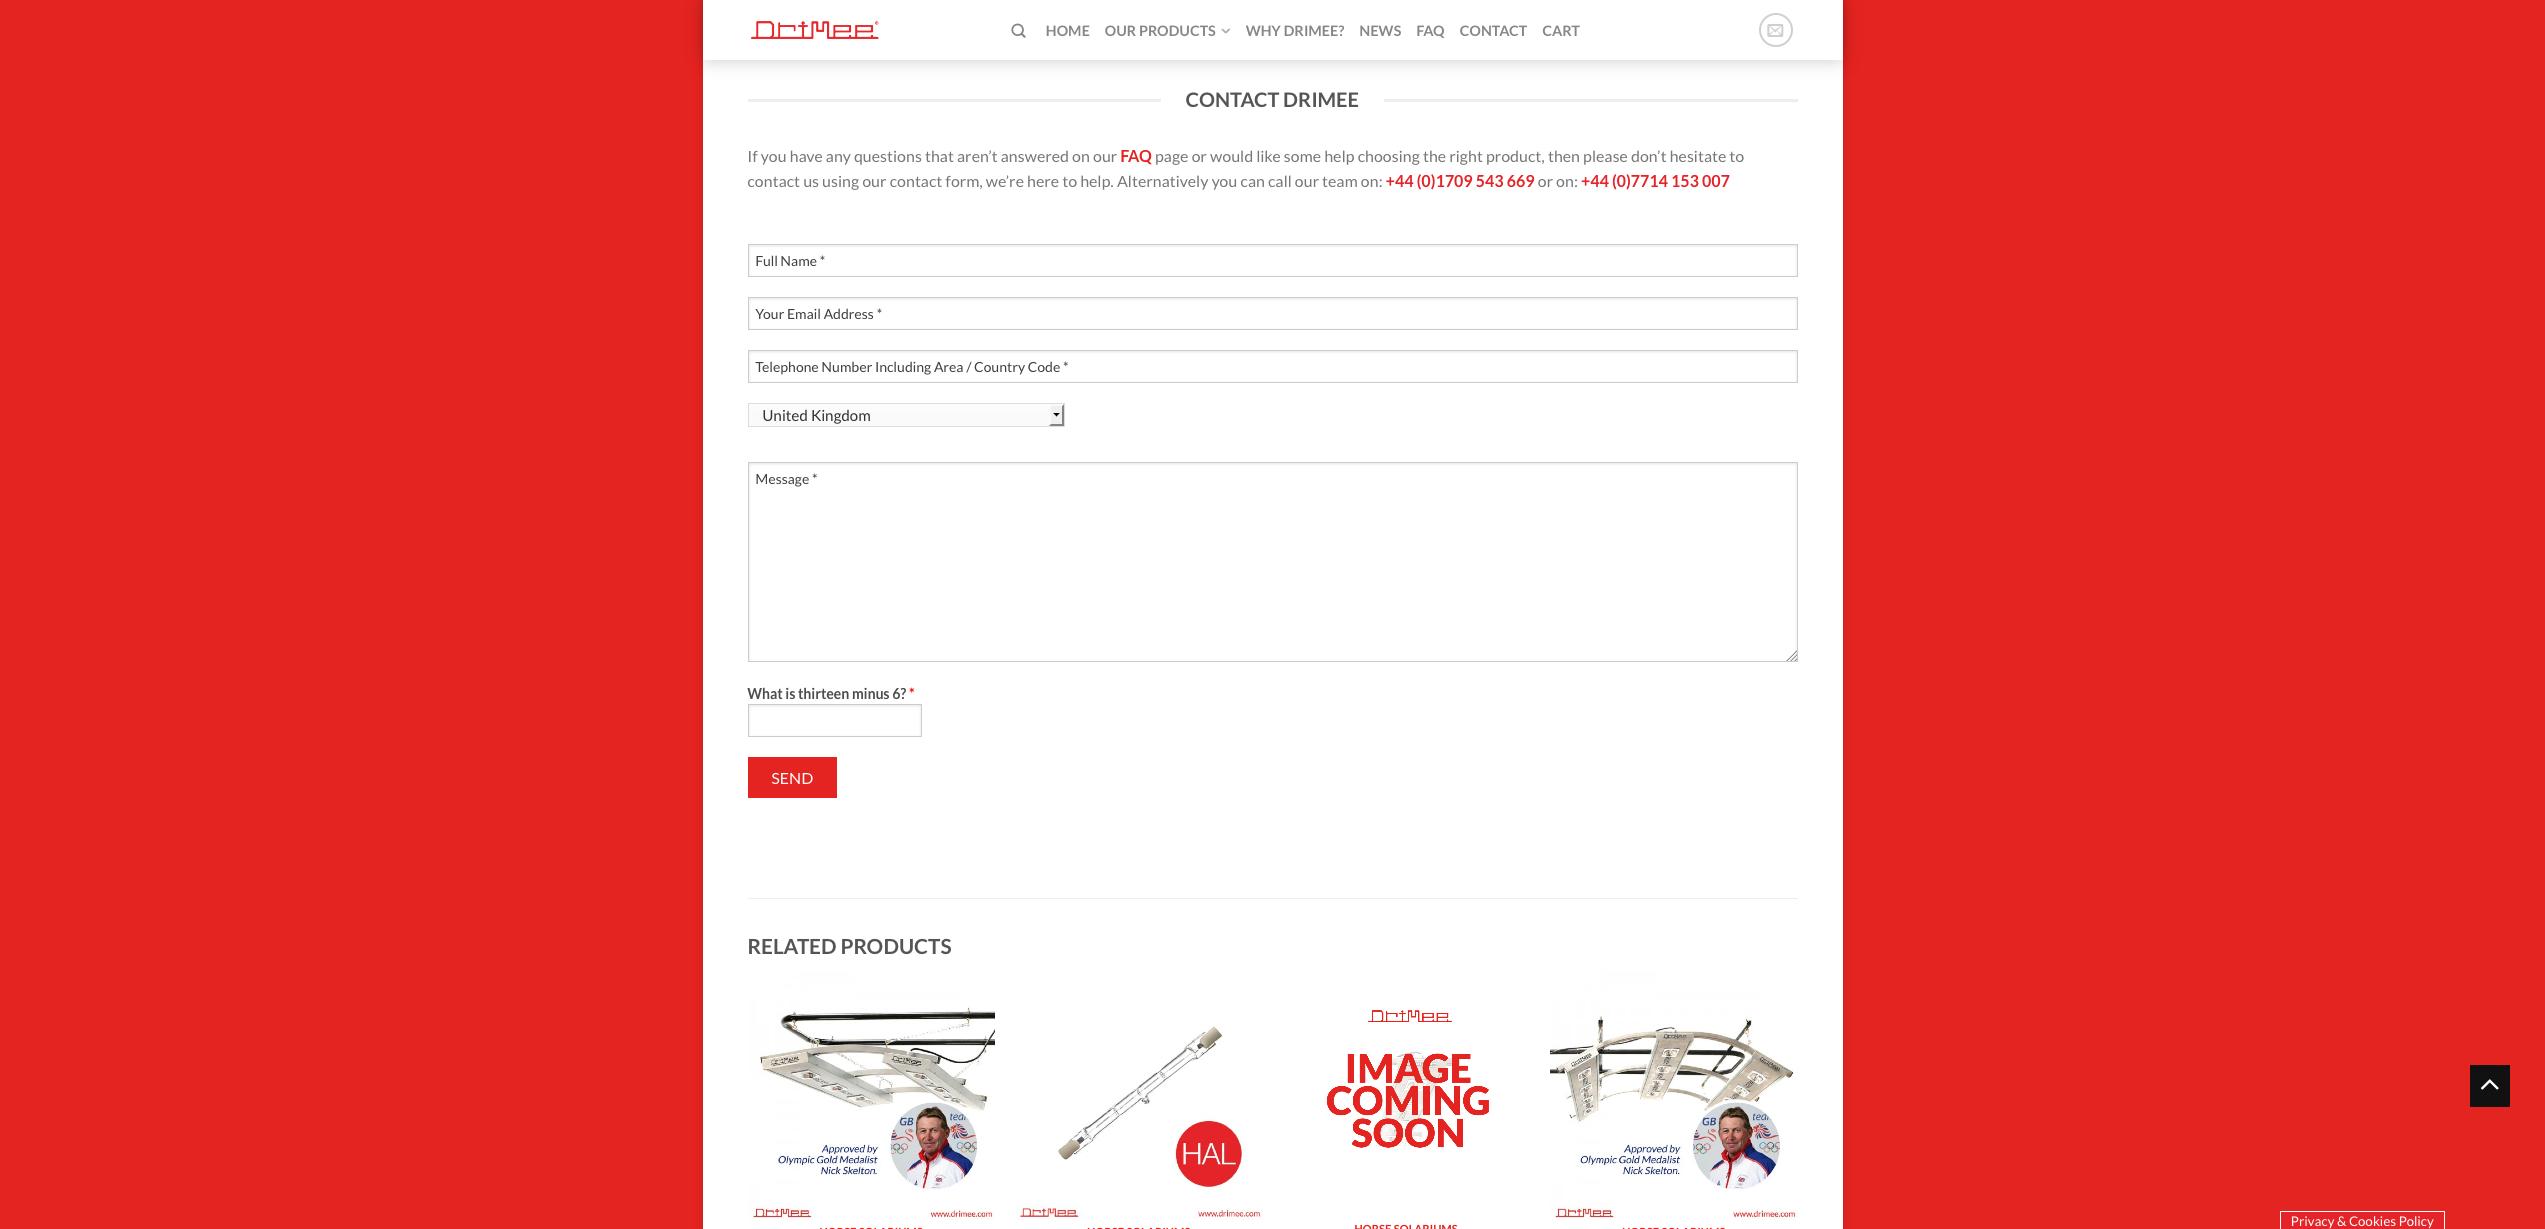 IDEA UK Design and Marketing Drimee Equestrian Horse Equipment Website Design 11